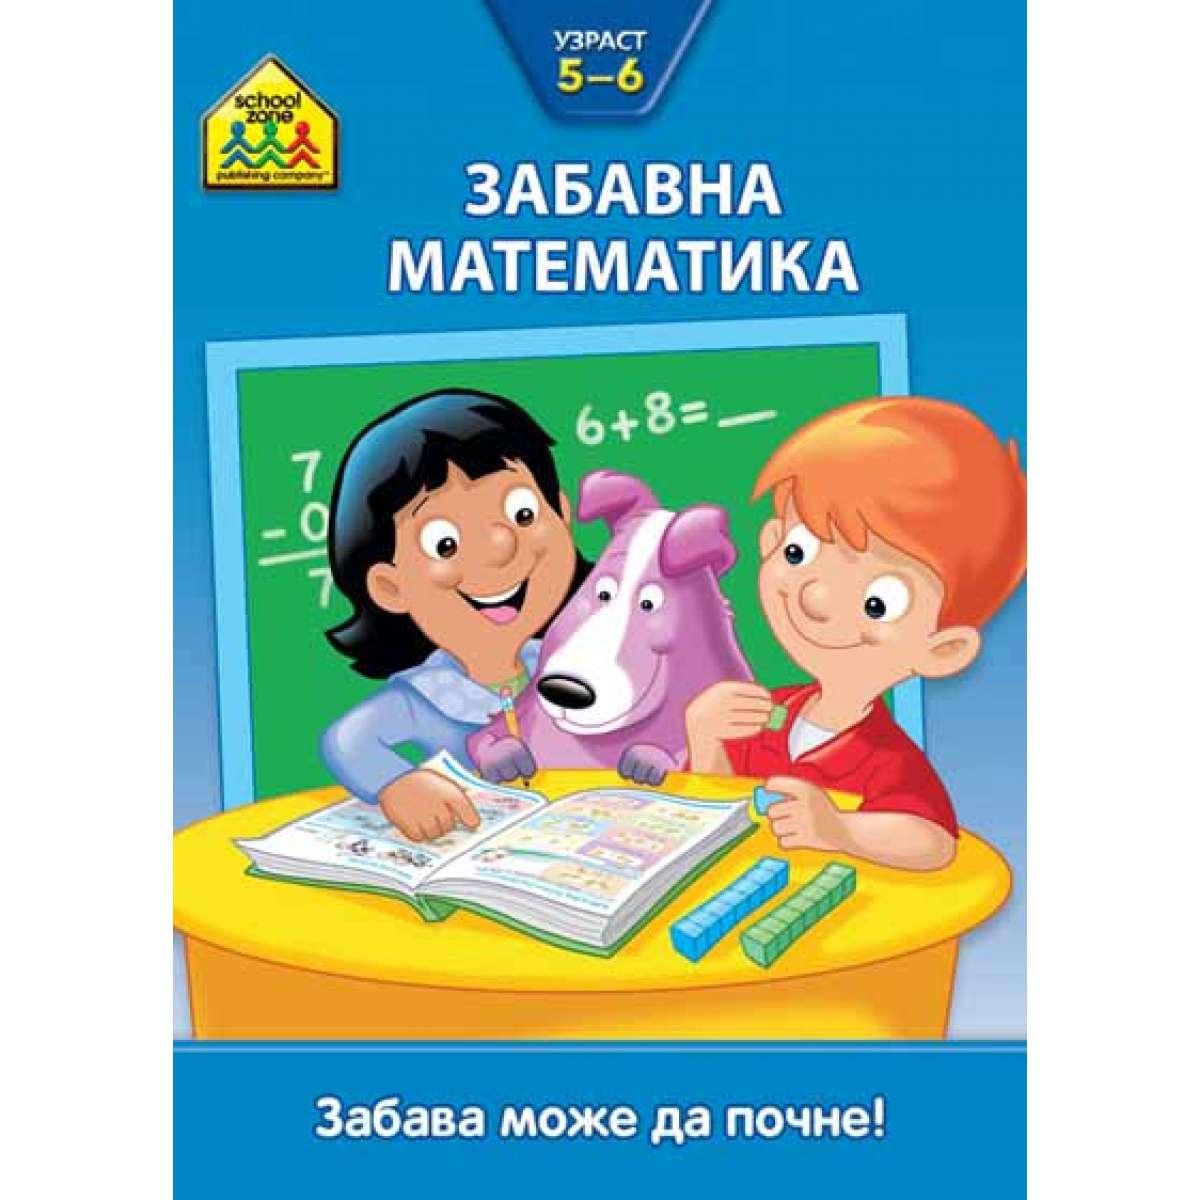 Vulkančićeva škola: ZABAVNA MATEMATIKA